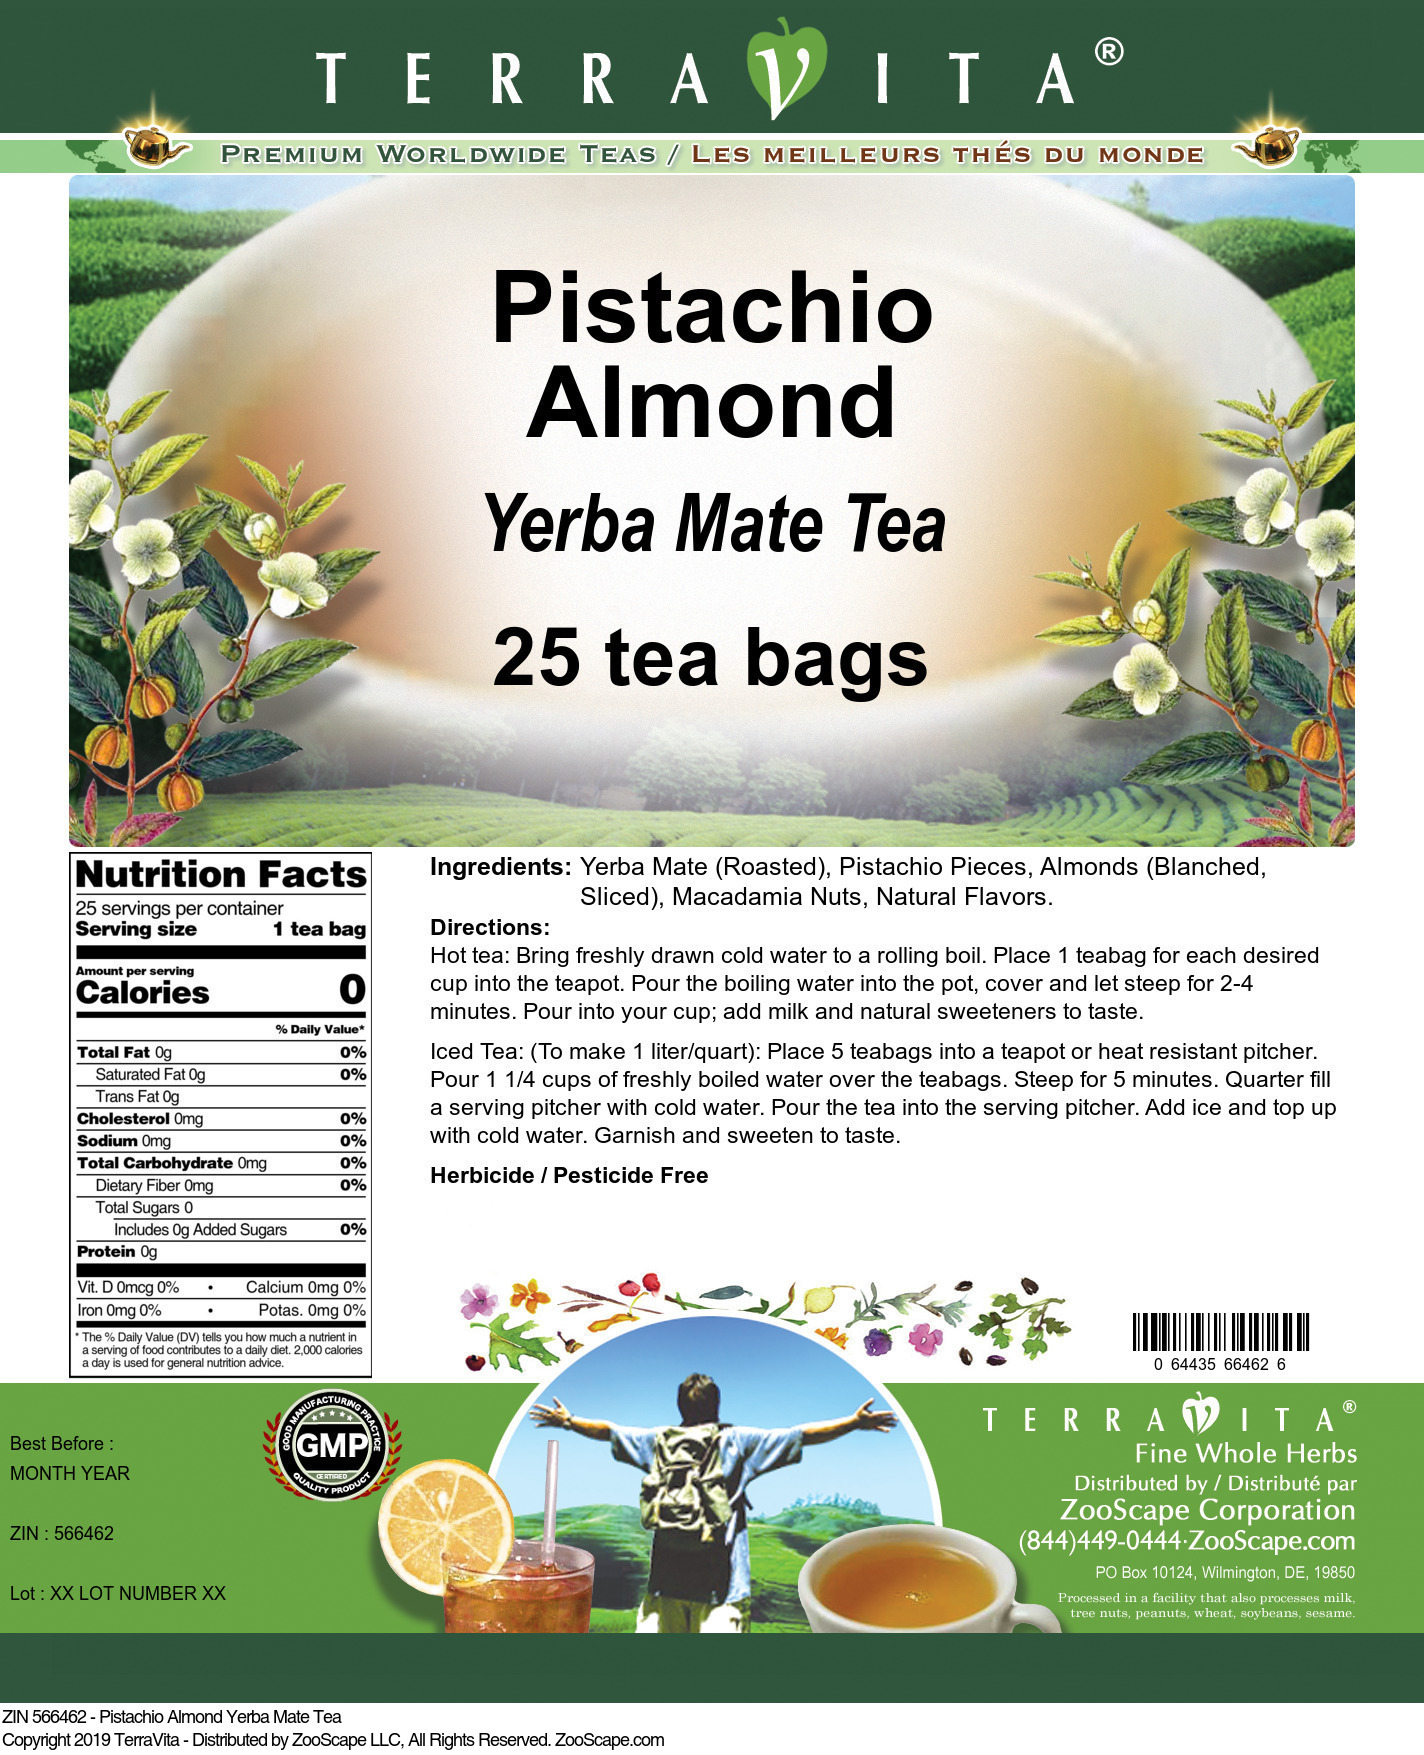 Pistachio Almond Yerba Mate